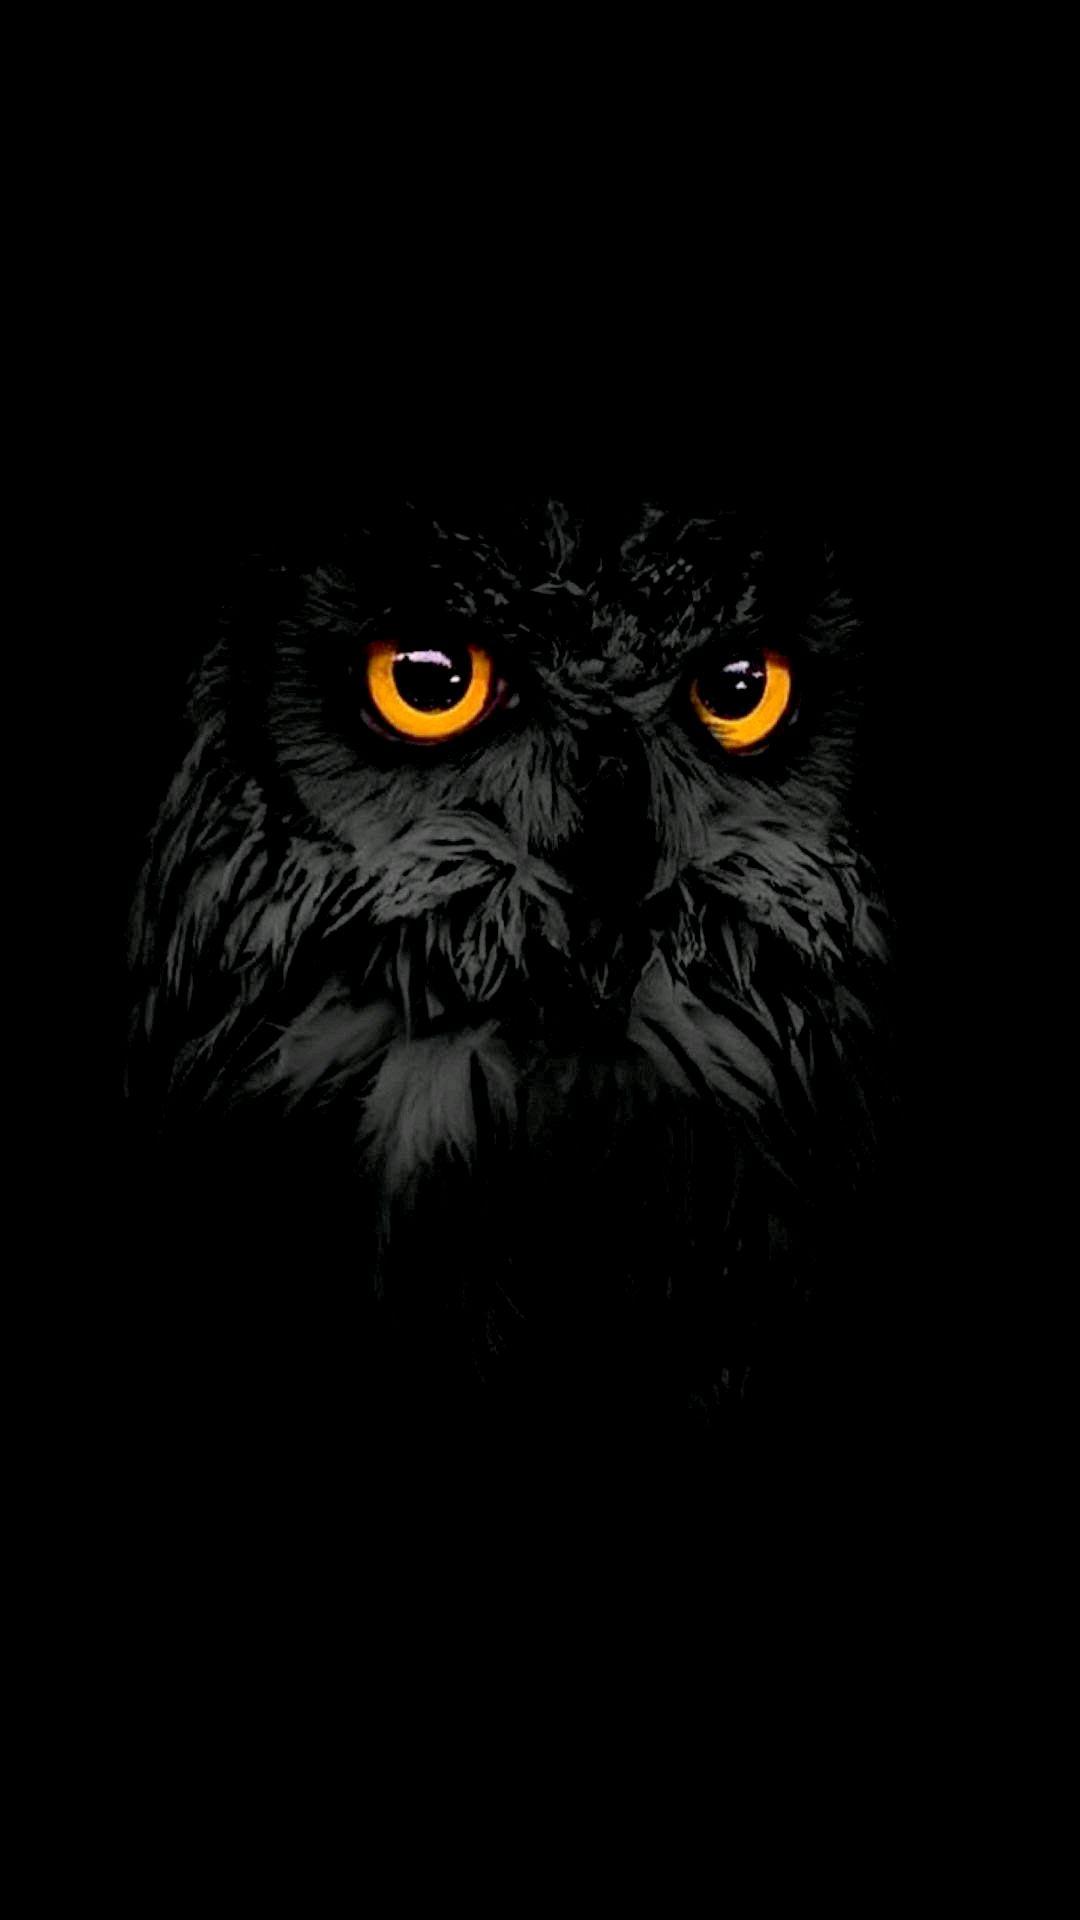 Halloween Owl Wallpaper Hd